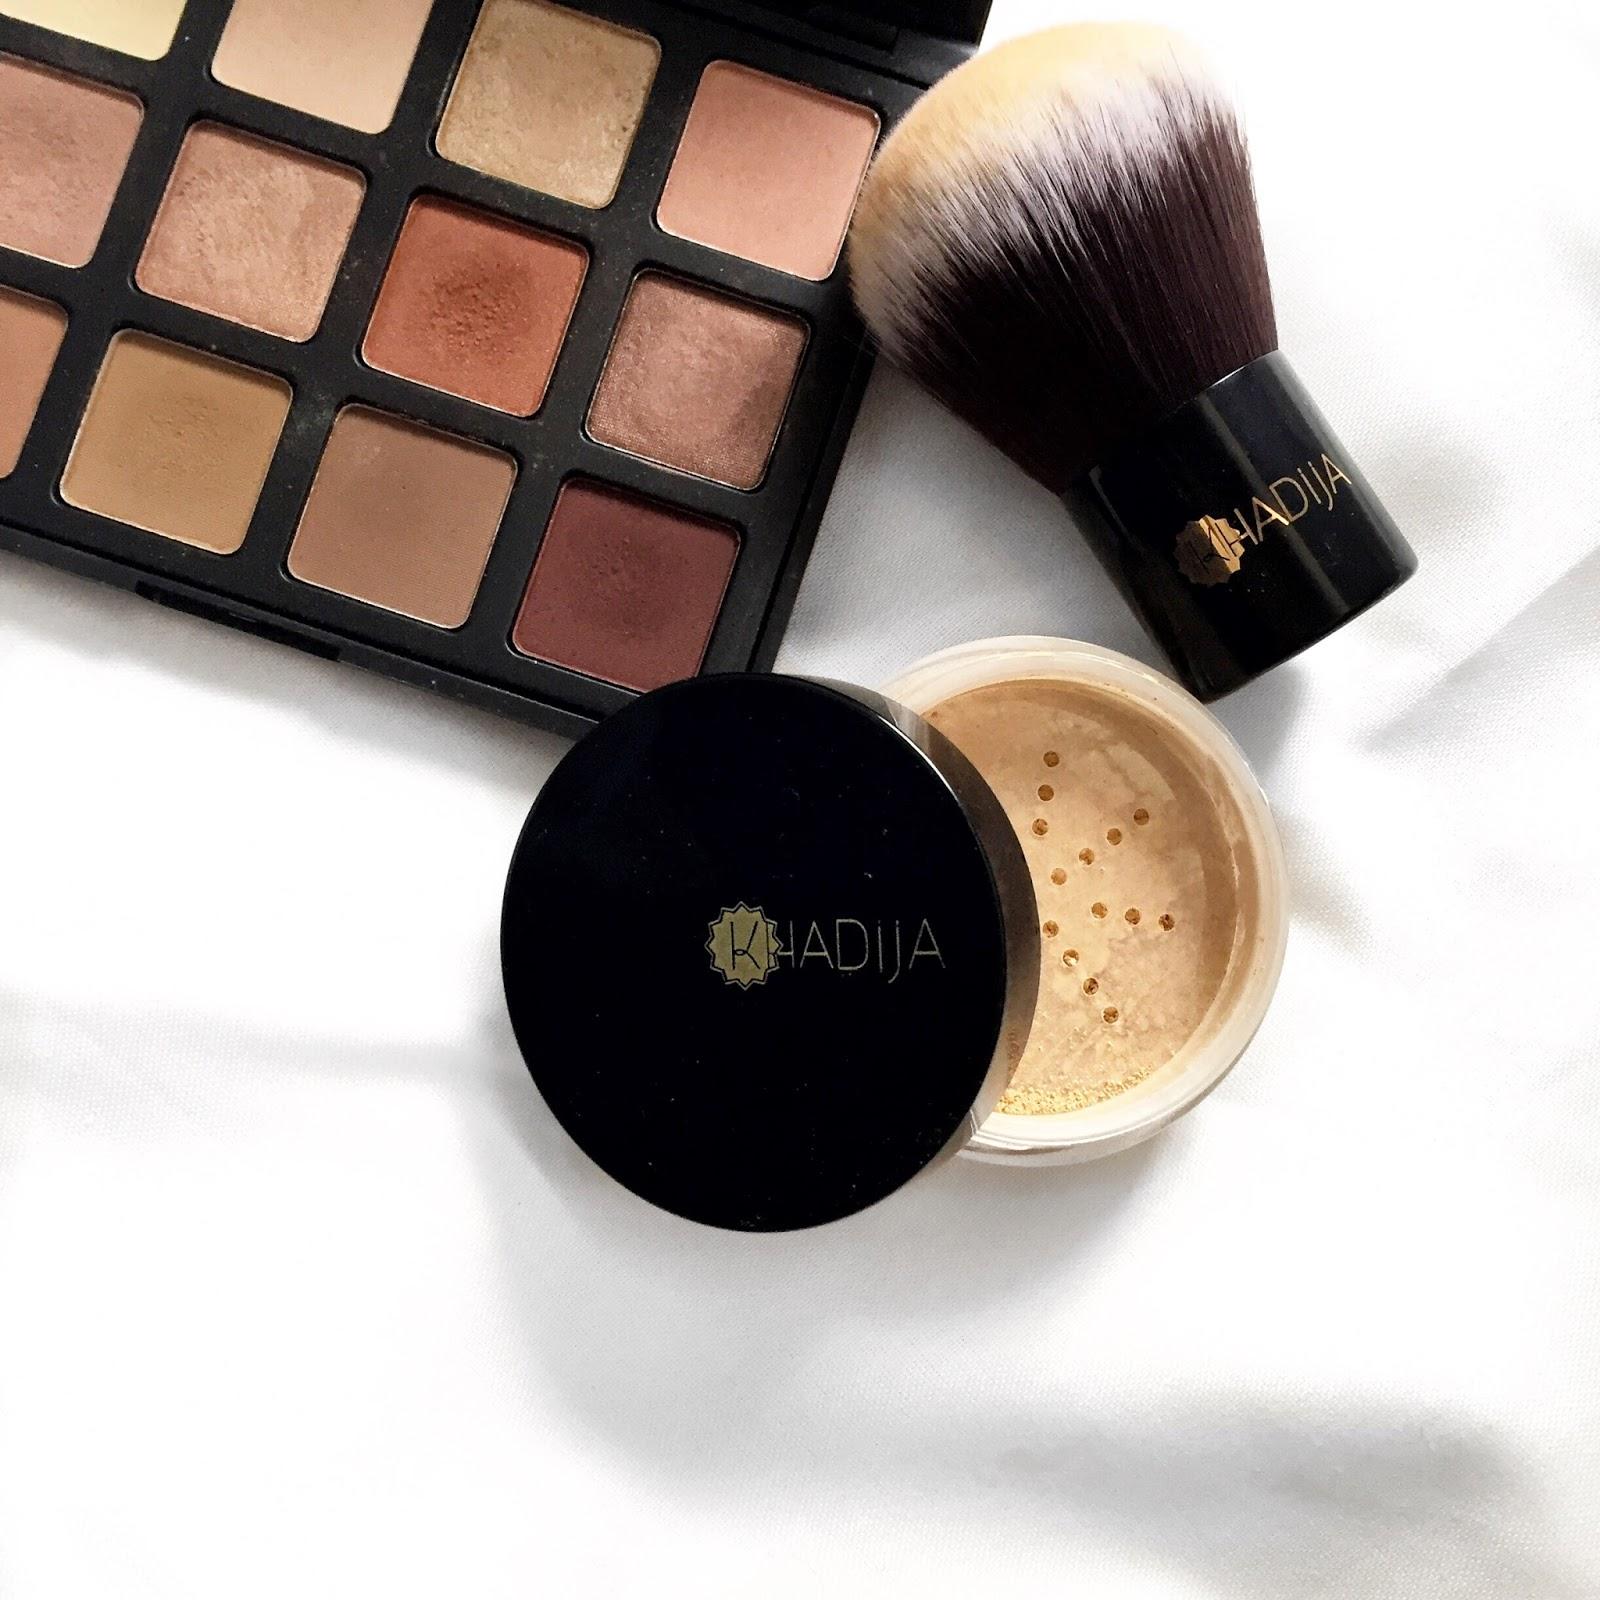 Sponsored] Khadija Cosmetics   My Little Cocoon - In My Shawls